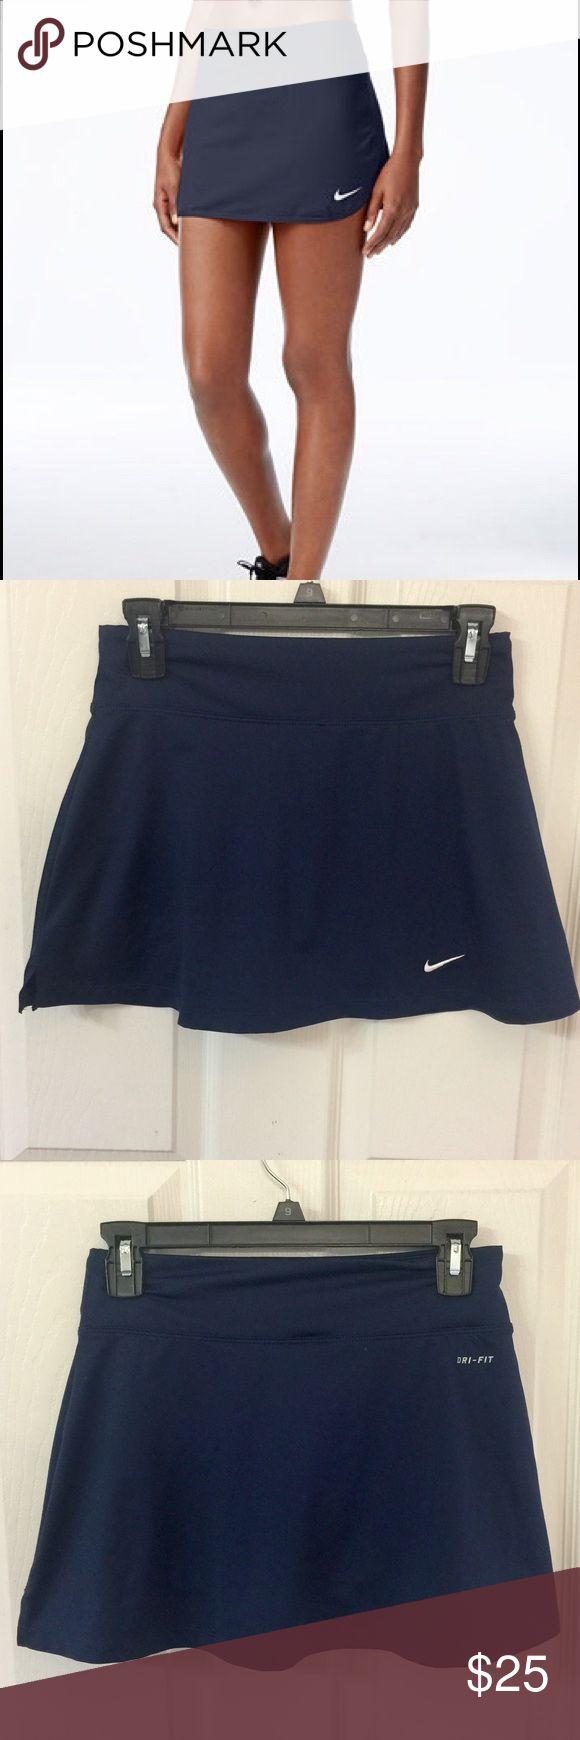 Nike Dri-Fit Tennis Skort. Size Small NWOT. Nike Dri-Fit Tennis Skort. Size Small. Never worn. Perfect for medium-impact exercise Dri-FIT moisture-wicking fabric Built-in shorts with ball pocket Dolphin hem Nike Shorts Skorts